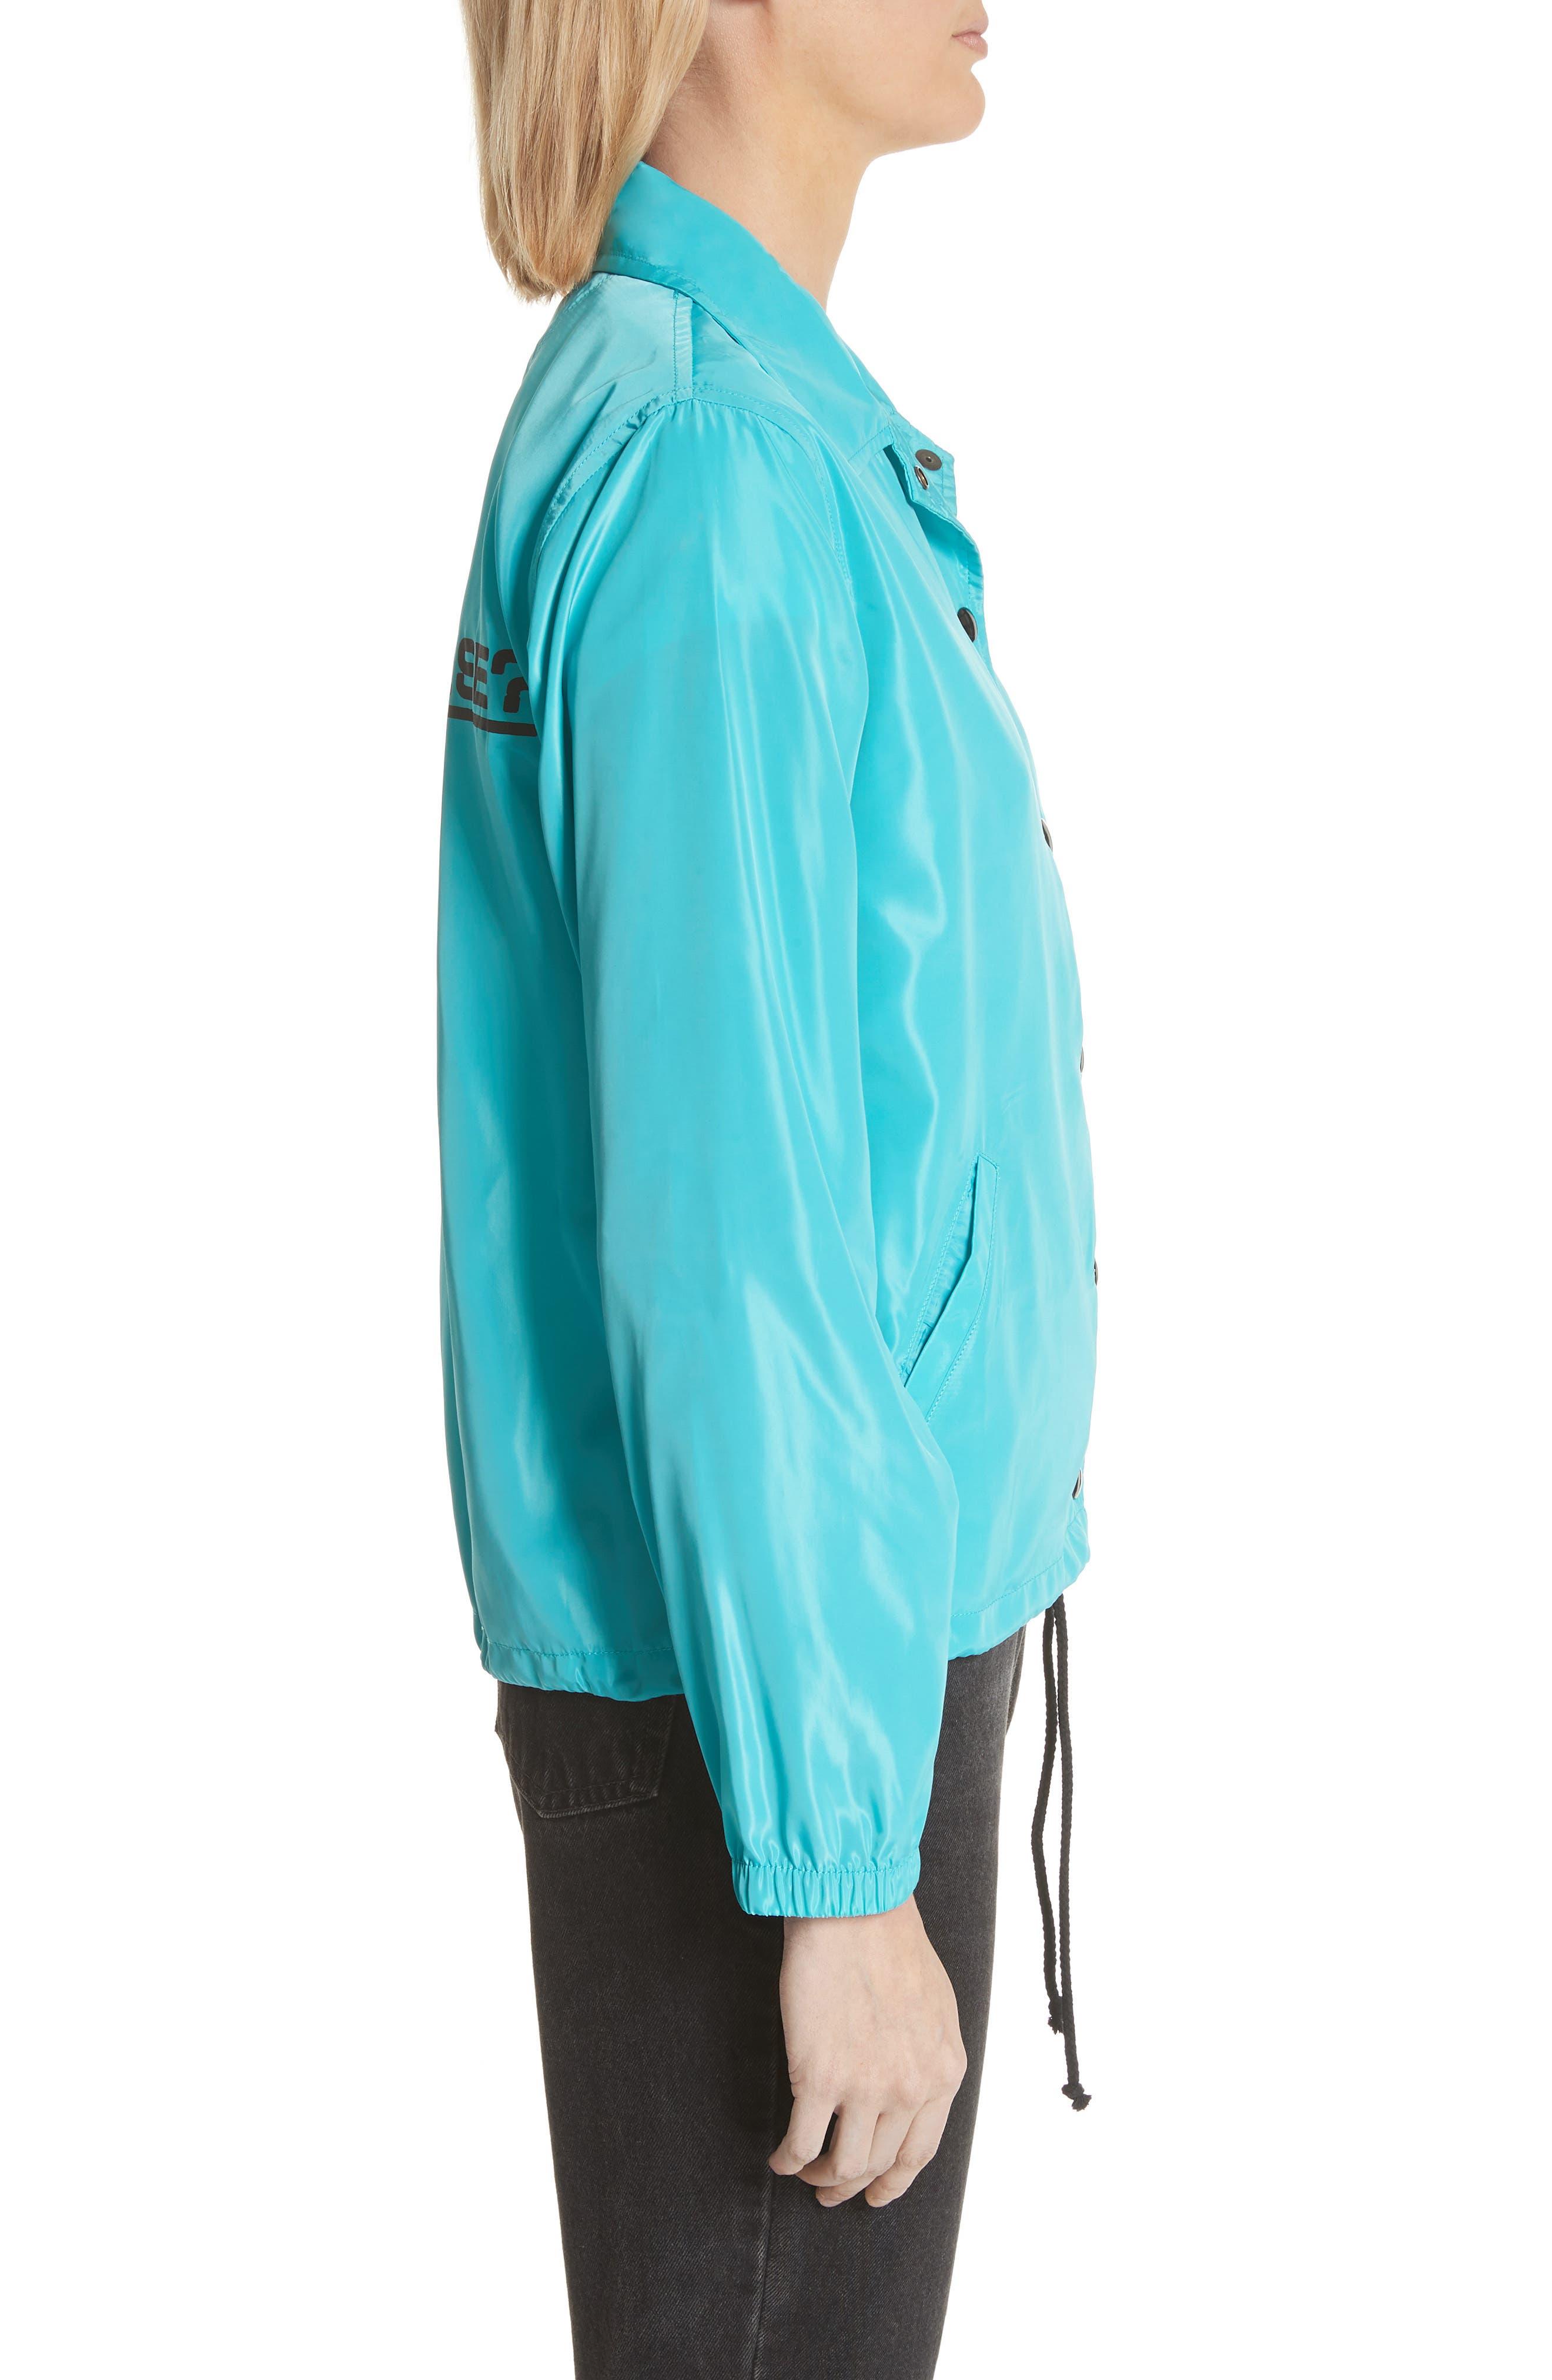 Parli Inglese Coach Jacket,                             Alternate thumbnail 3, color,                             Turquoise